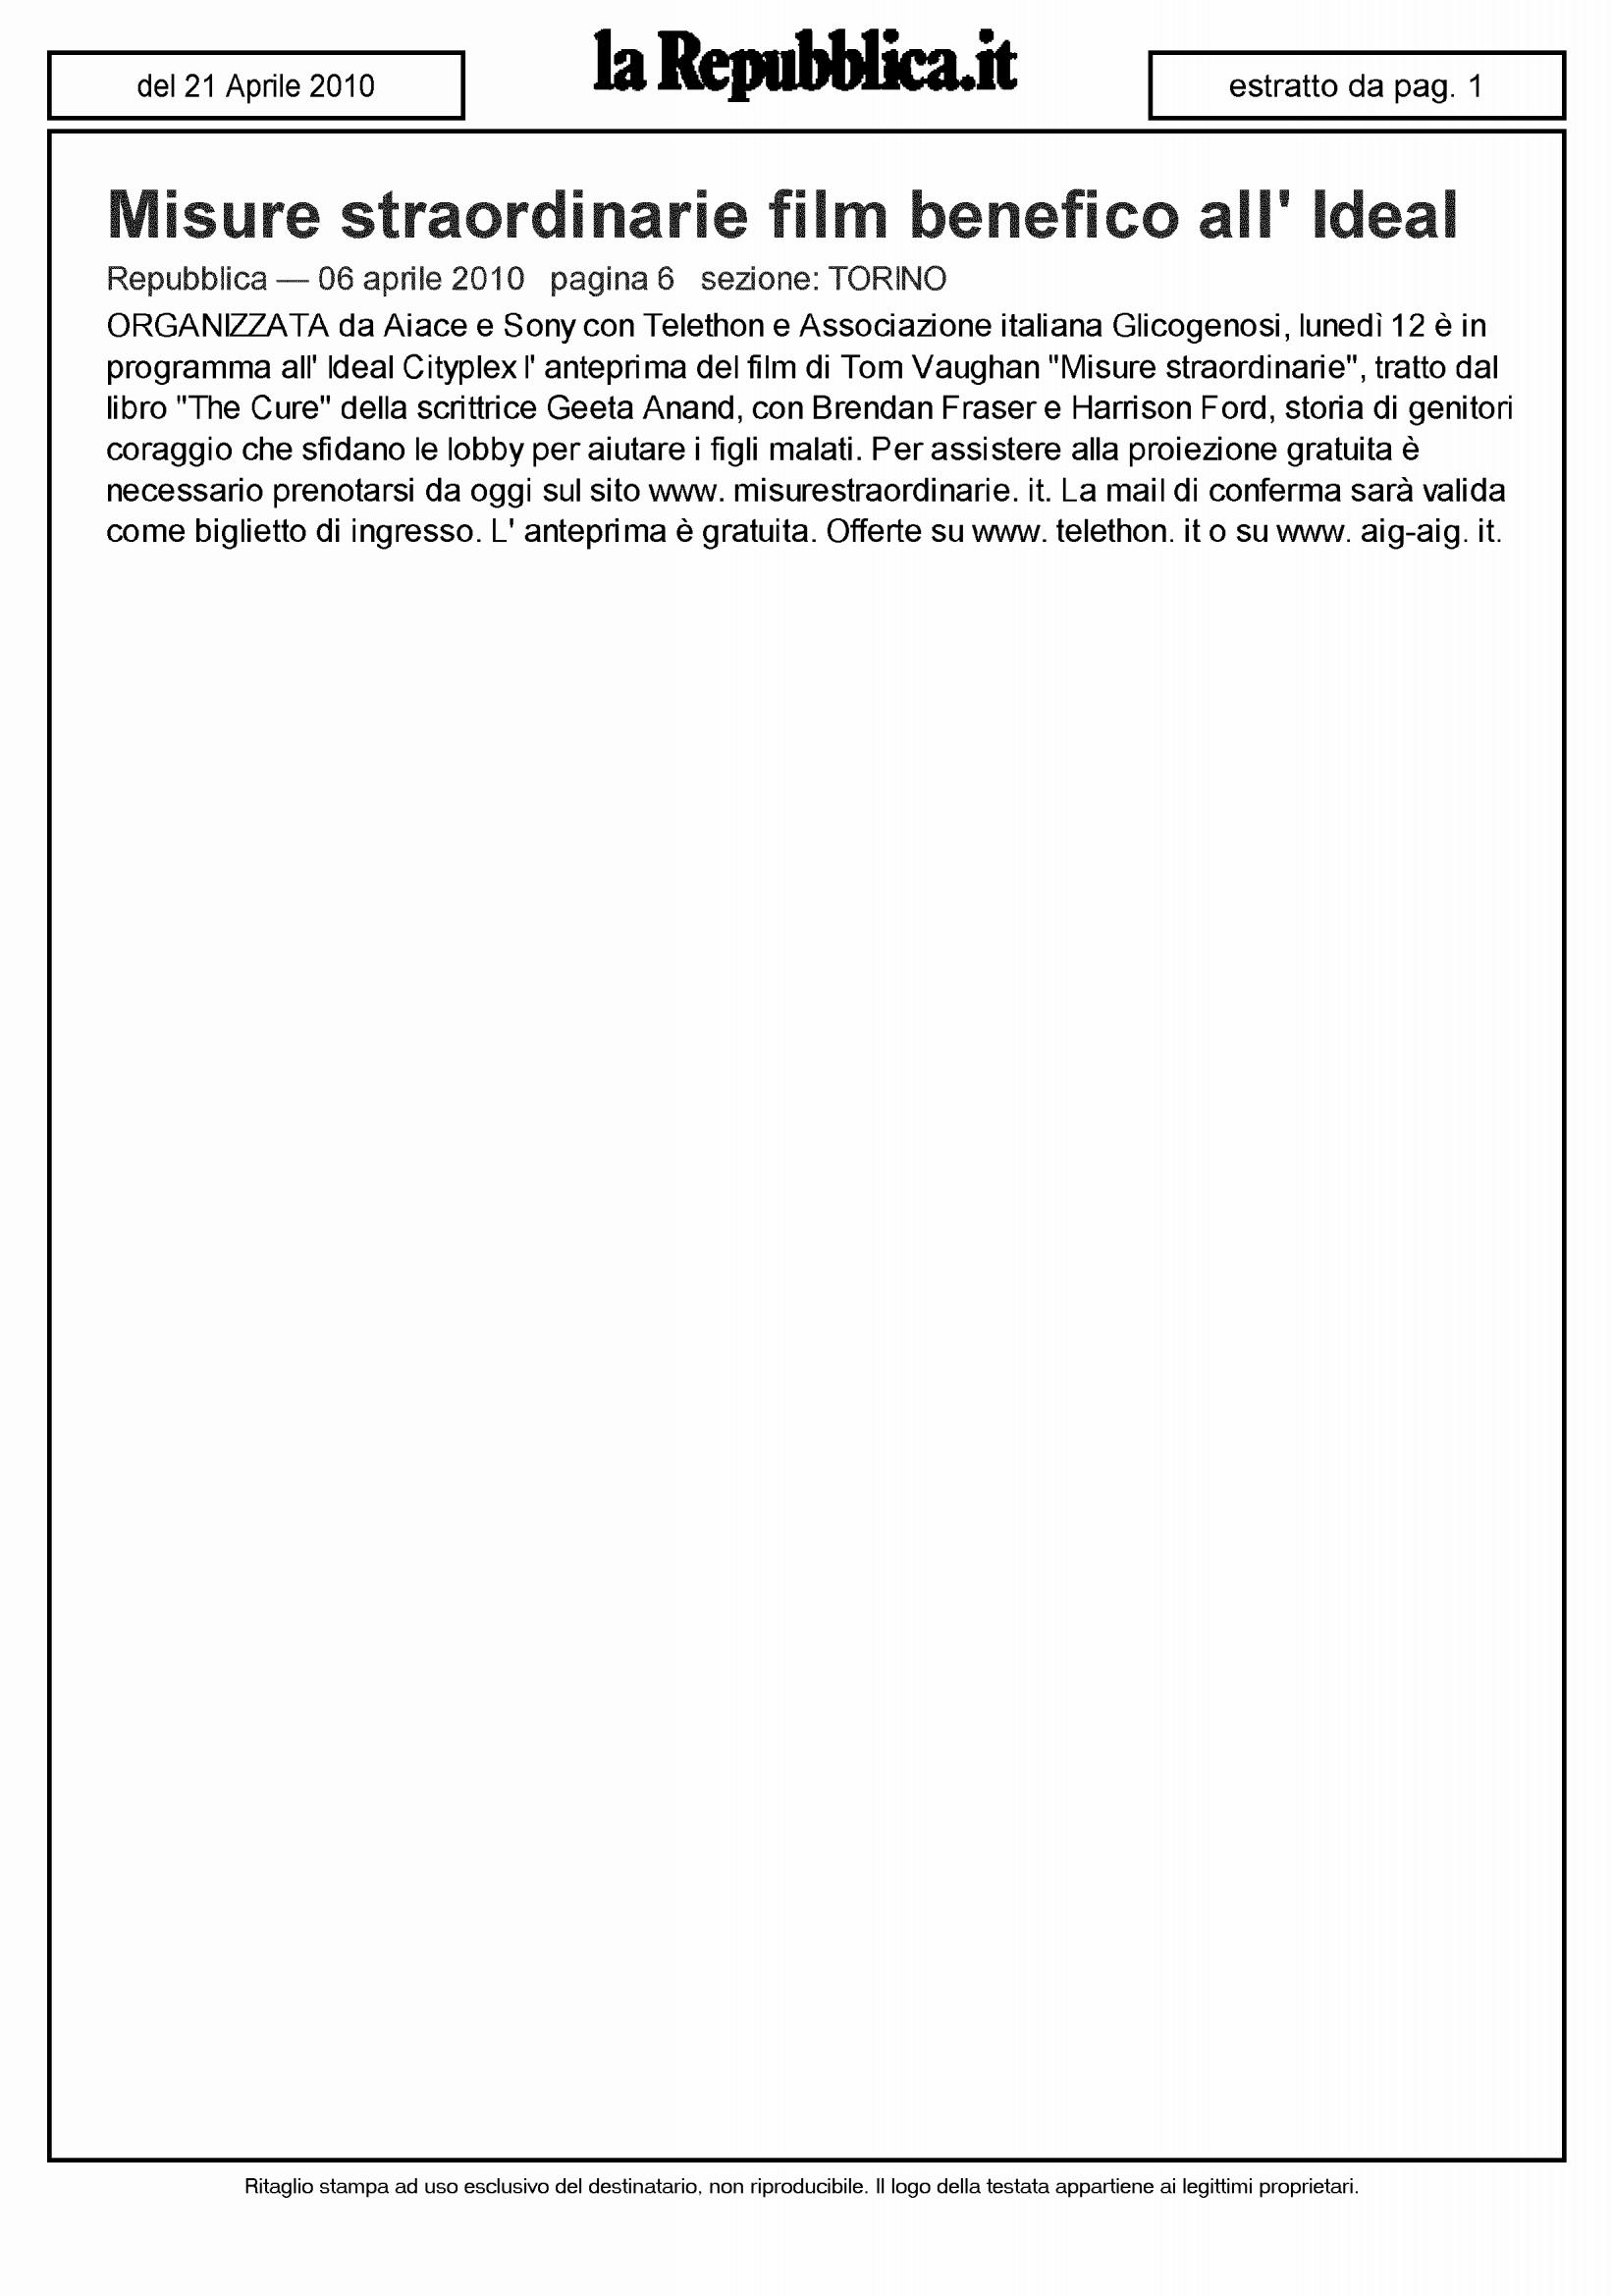 Stampa_20100422_misure straordinarie_Page_64